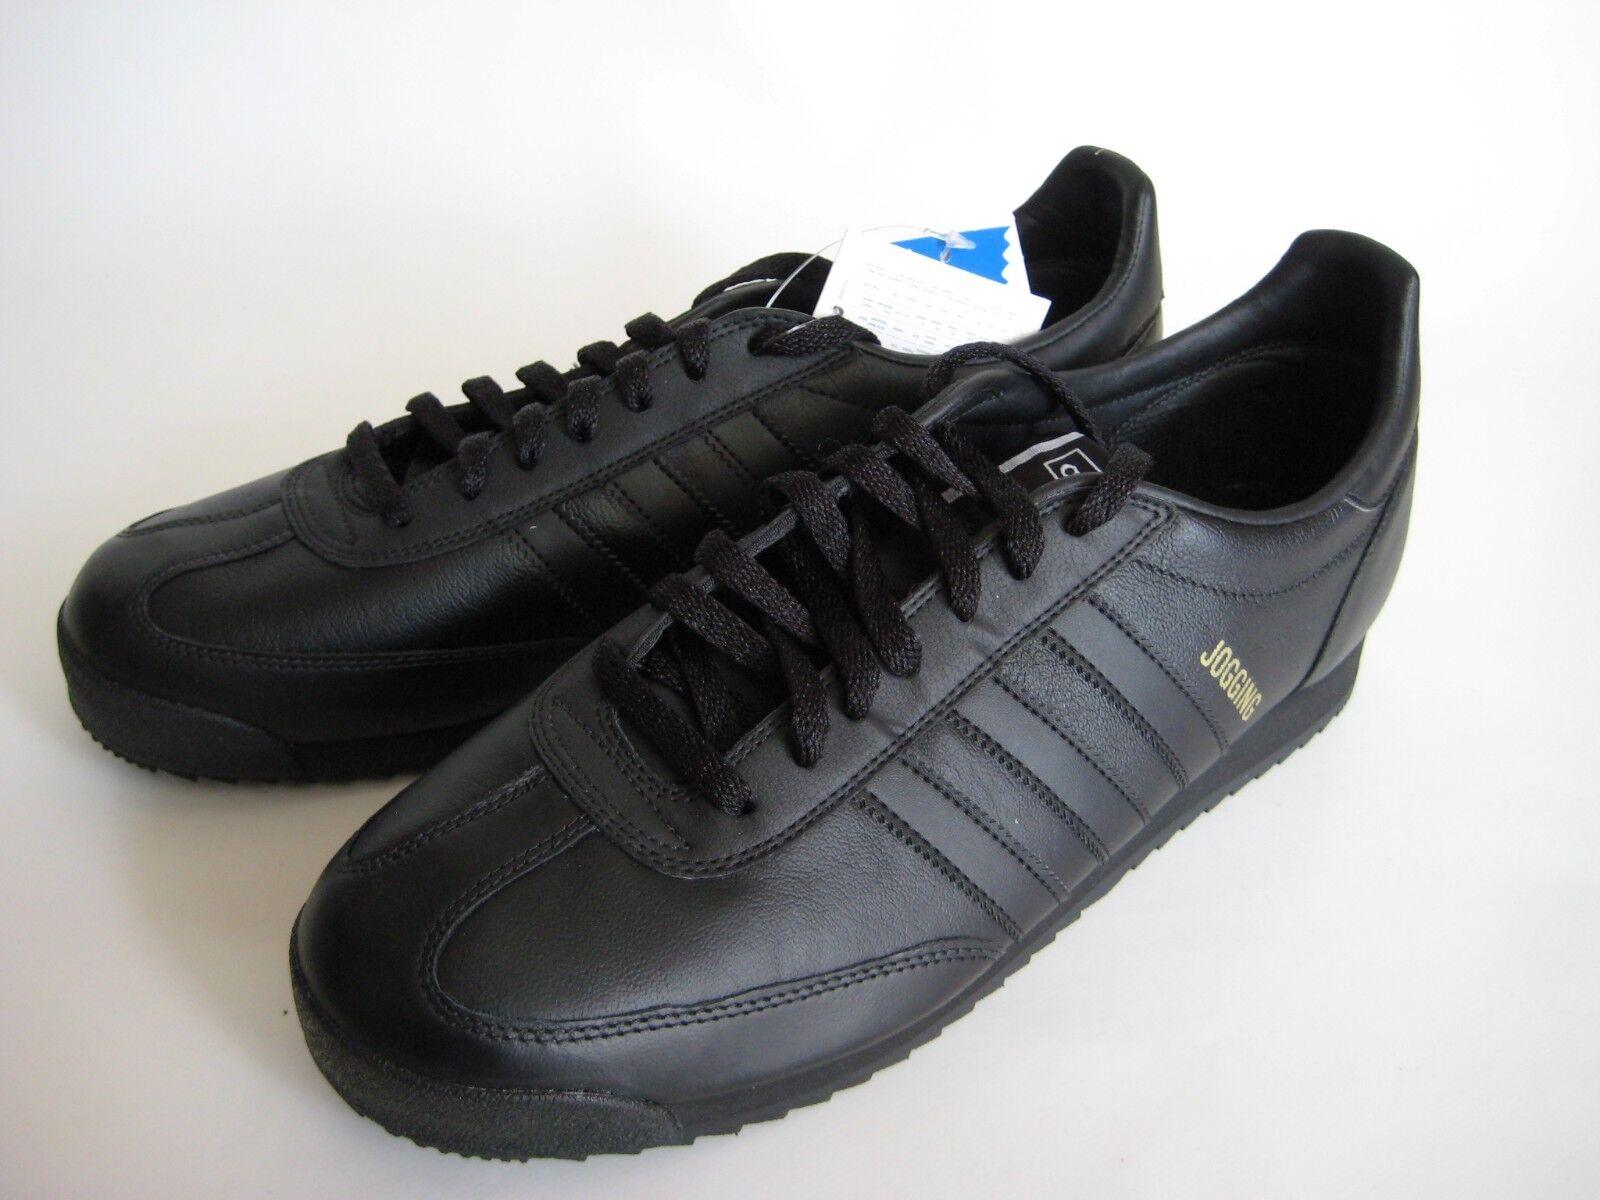 Adidas retro schuhe Model